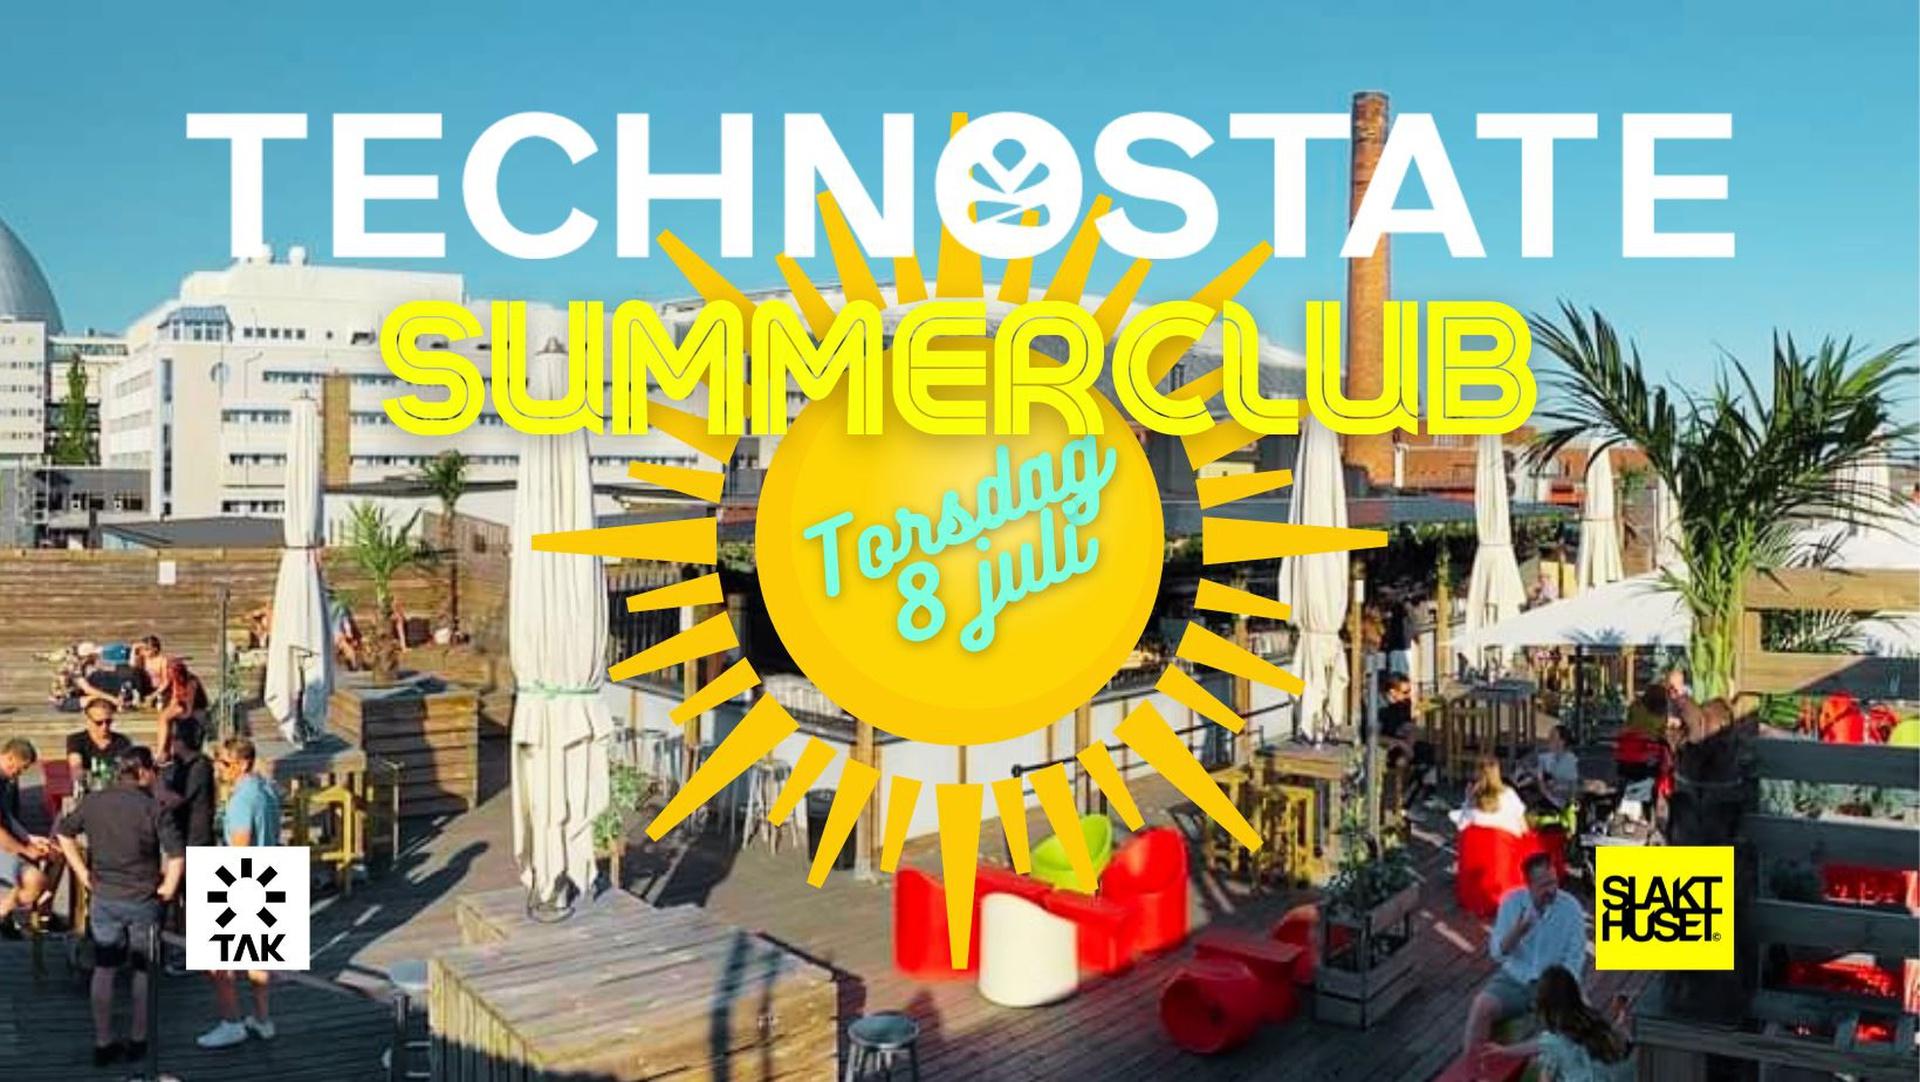 Event: Technostate Summerclub